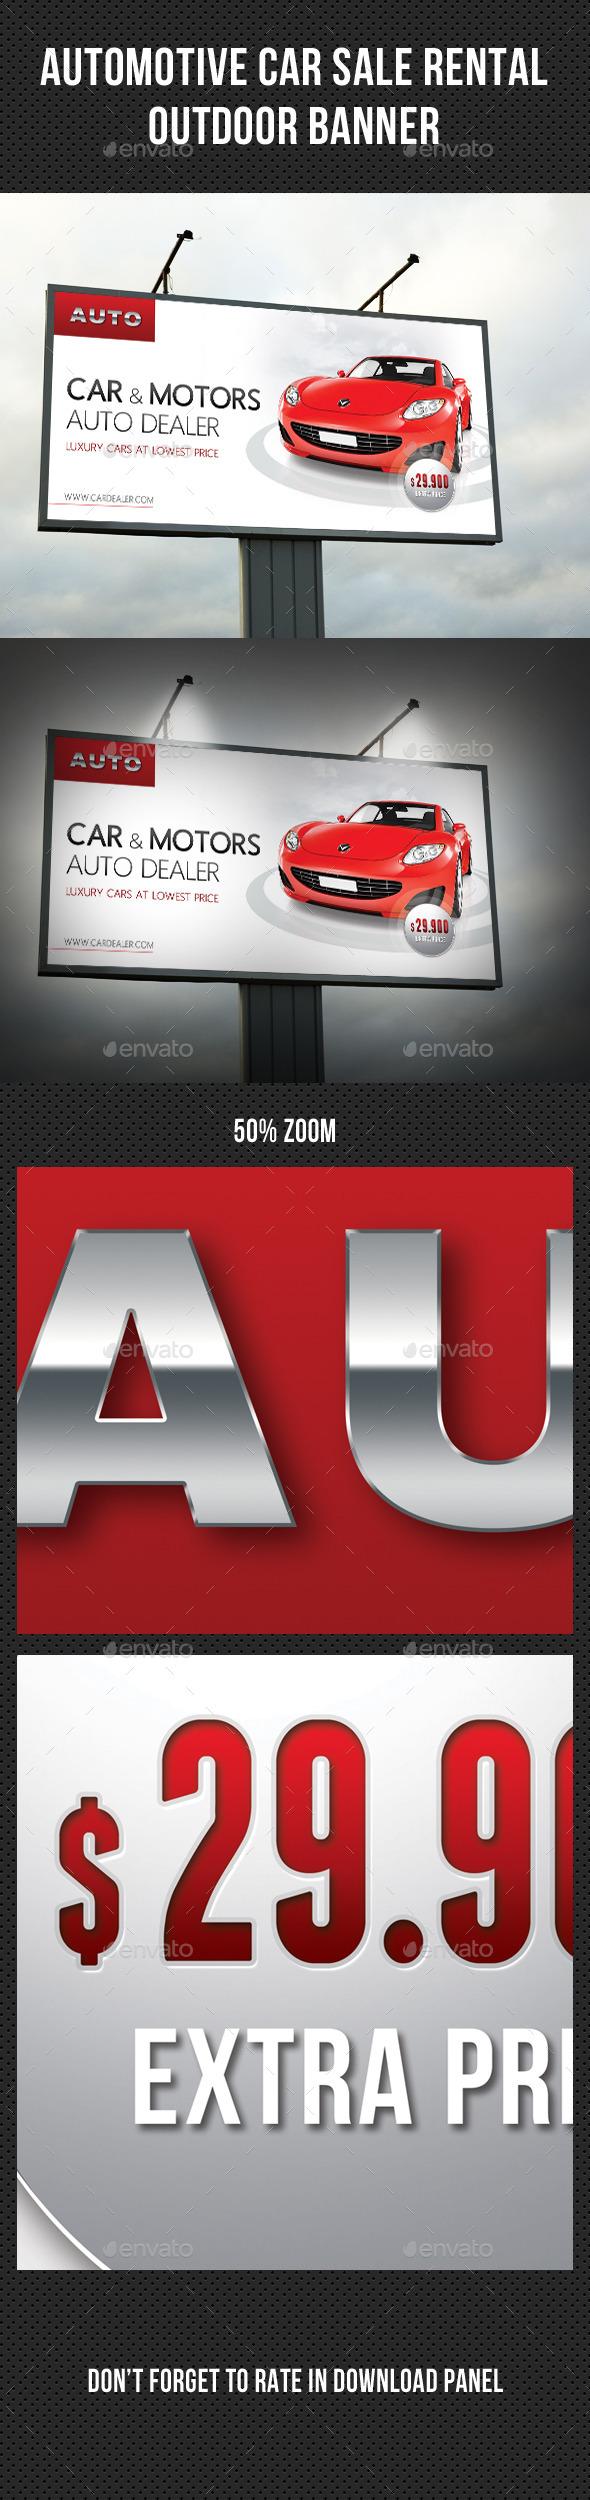 GraphicRiver Automotive Car Sale Rental Outdoor Banner 10799941